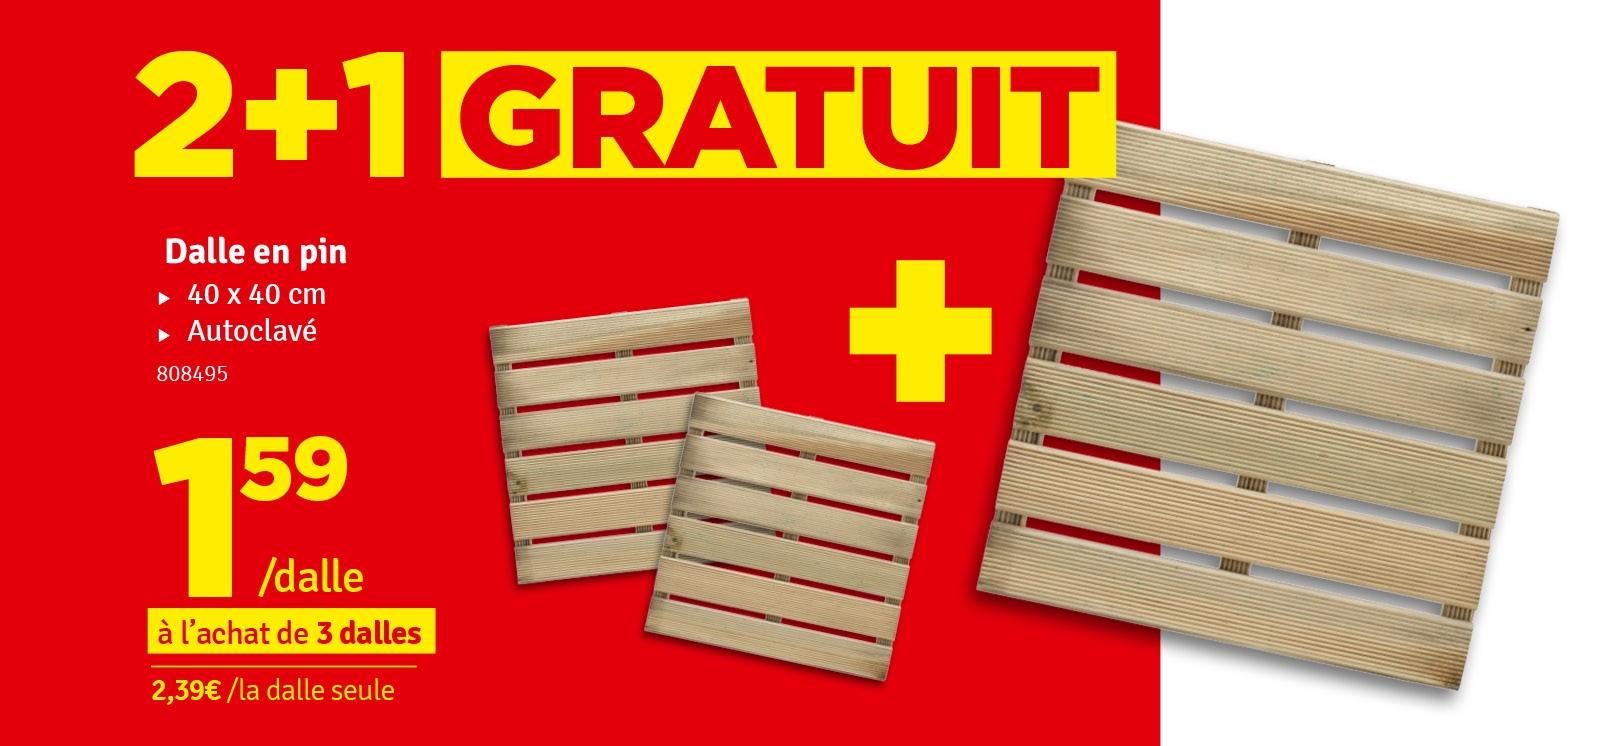 Promo - Dalle en bois 40 x 40 x 2,8 cm